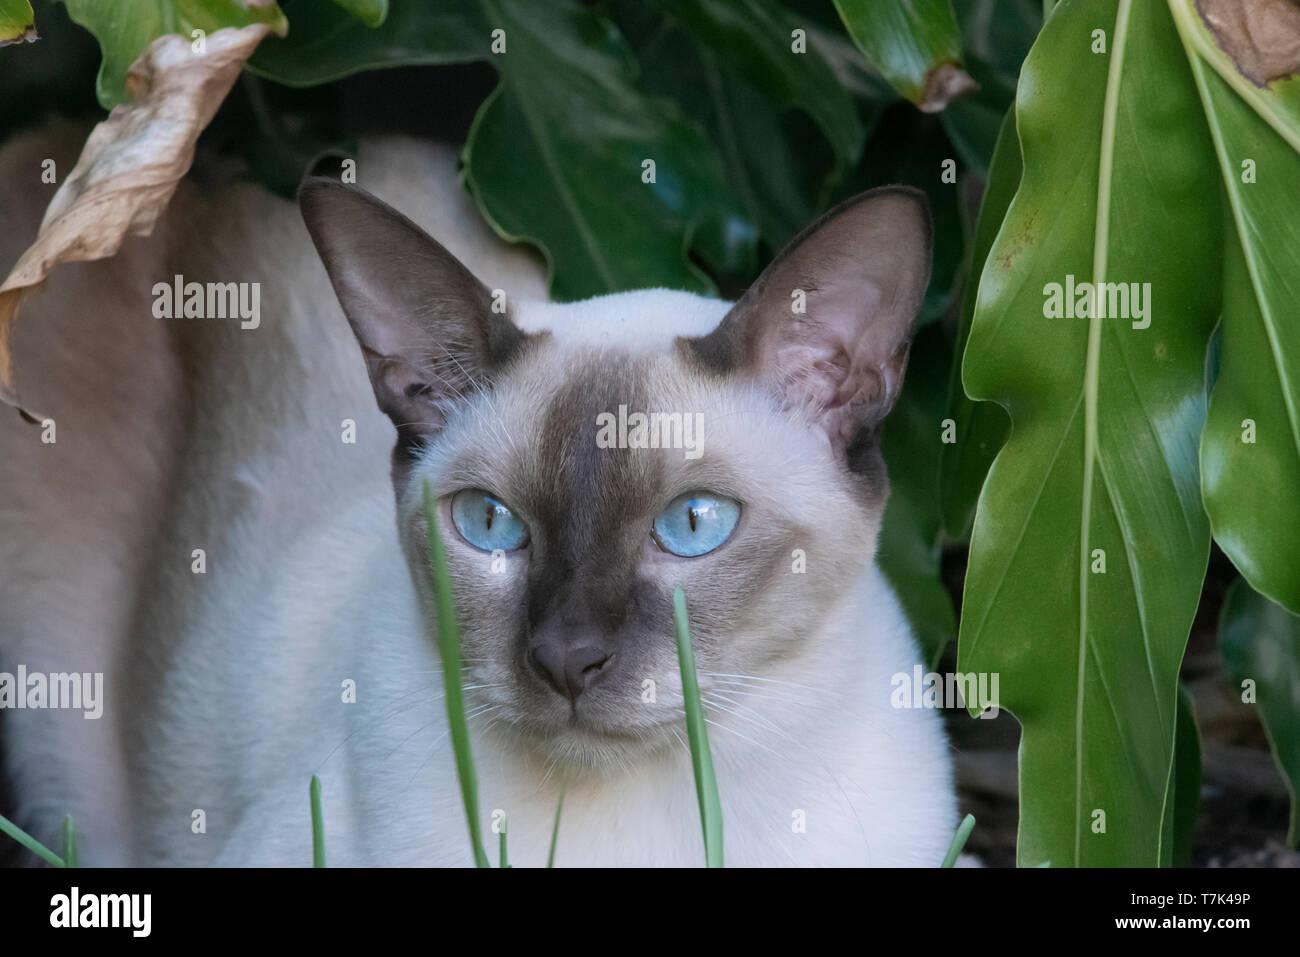 cat in a garden - Stock Image